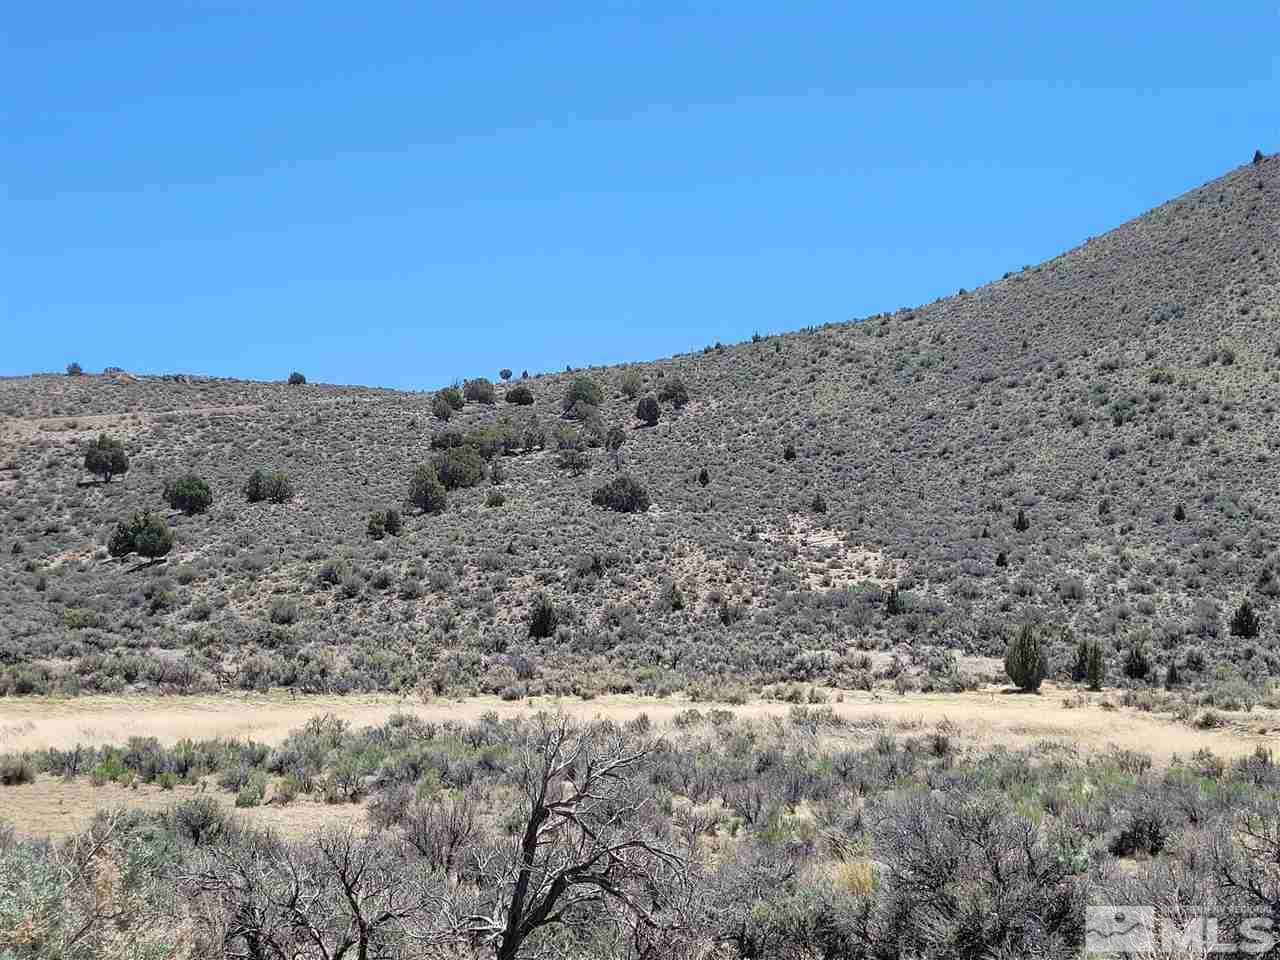 Image for 0 Chokecherry APN 078-271-21, Reno, NV 89508